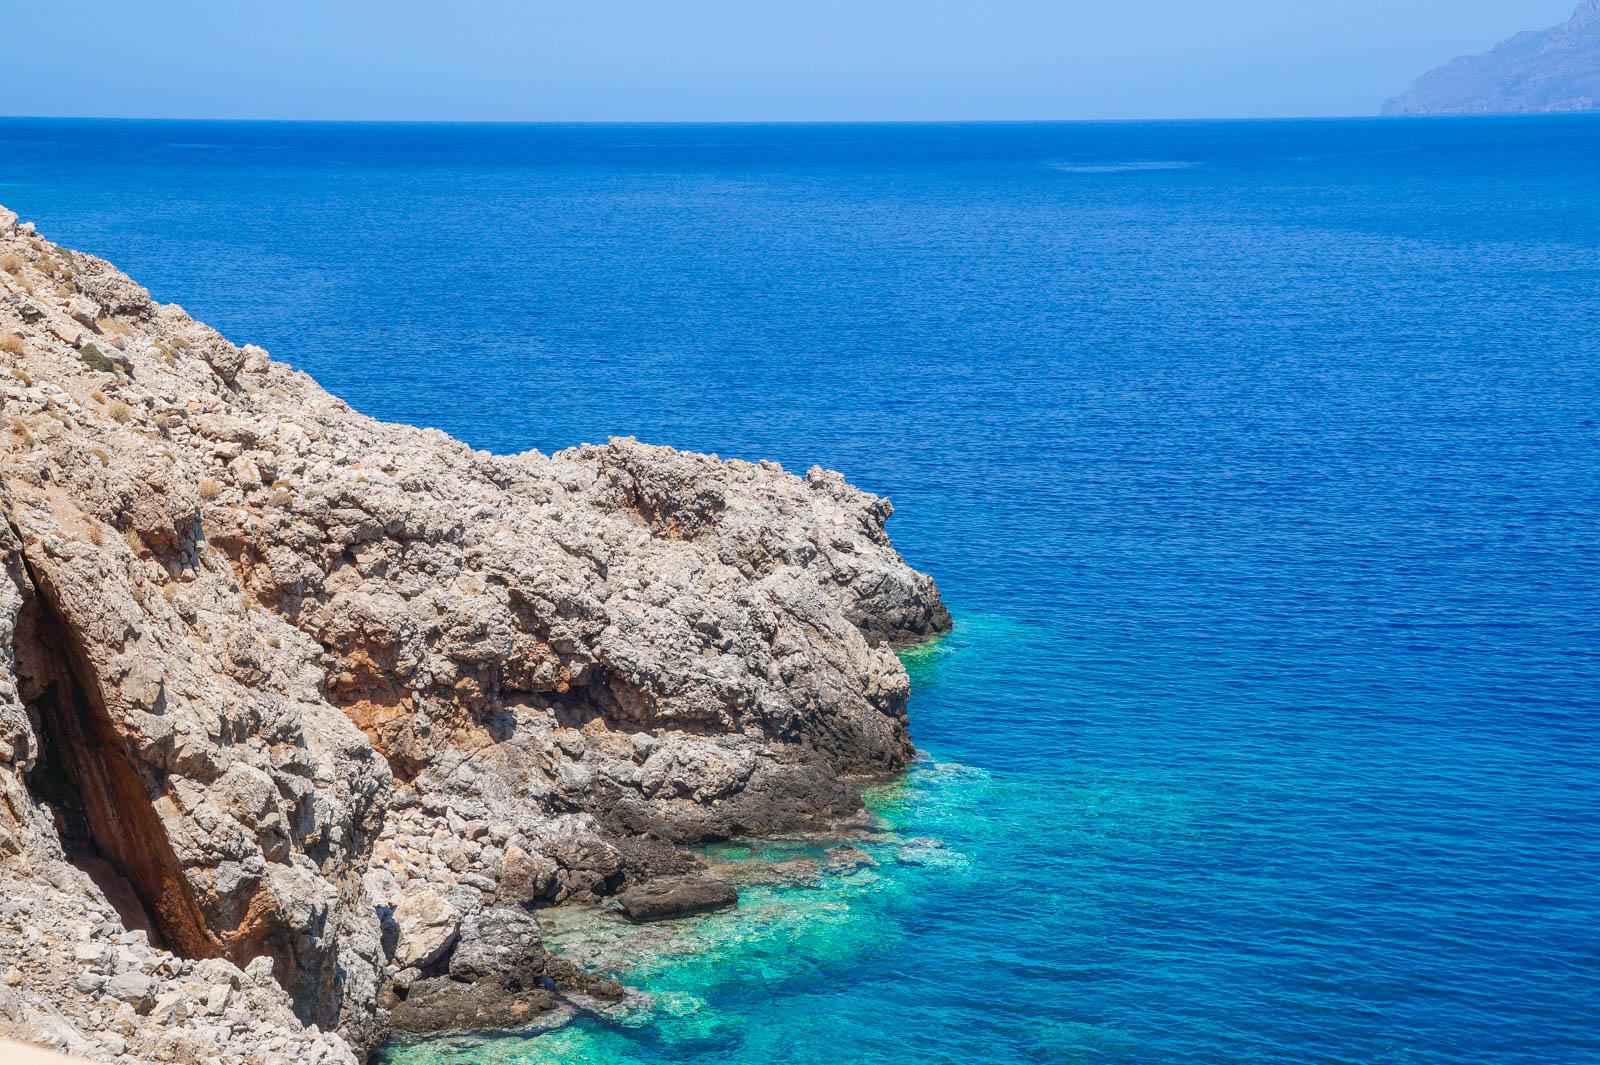 mpalos-beach-crete-greece-la-vie-en-blog-all-rights-reserved-2